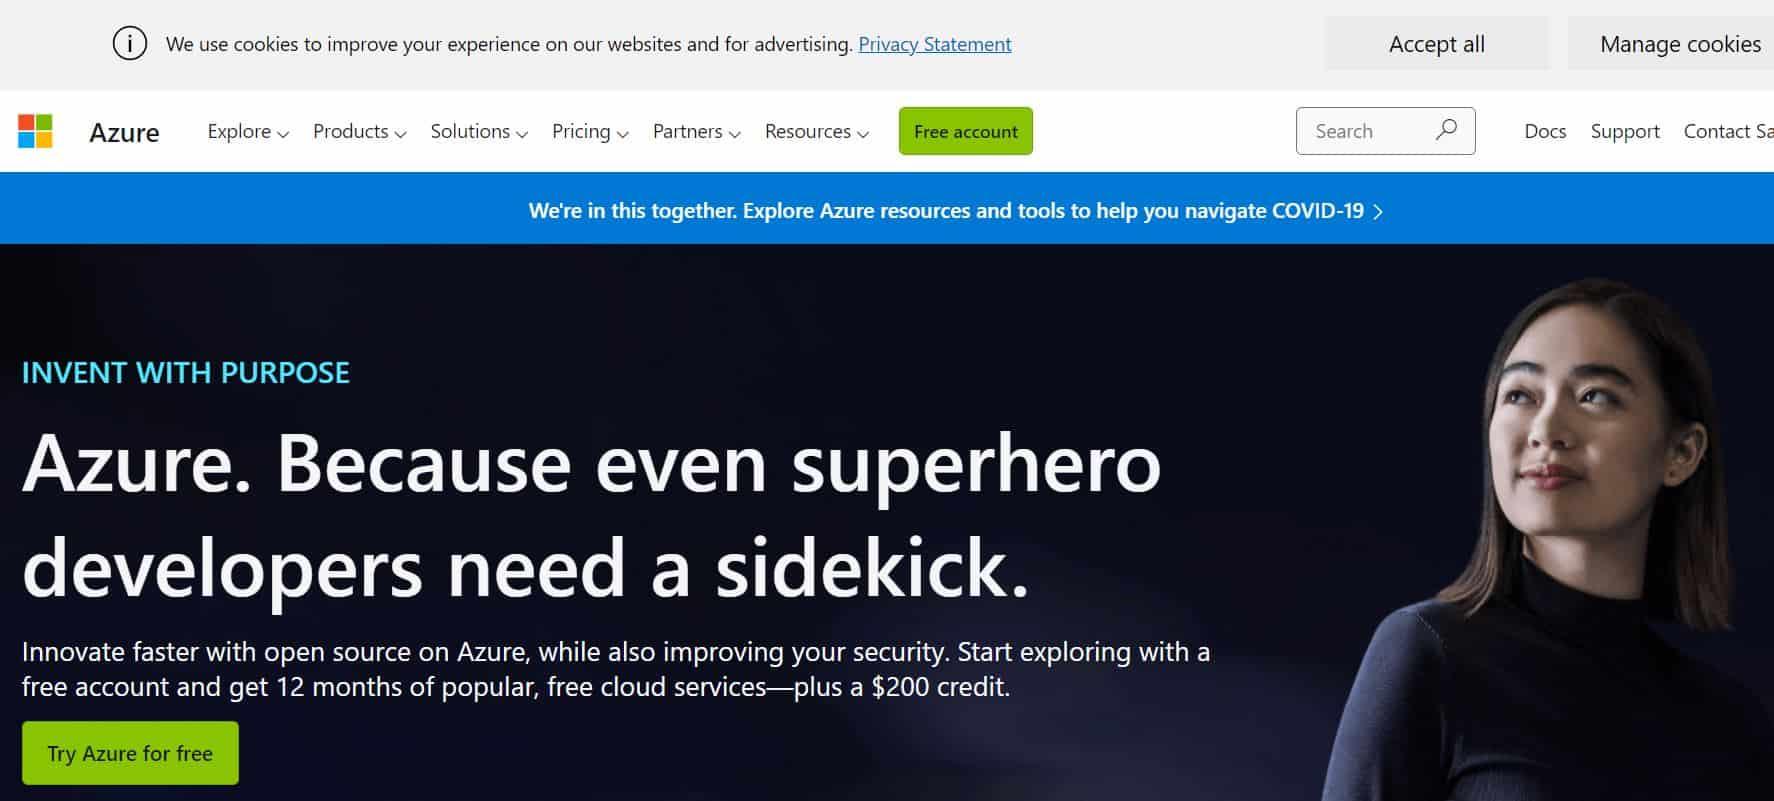 Microsoft Azure an Amazon AWS competitor and alternative.